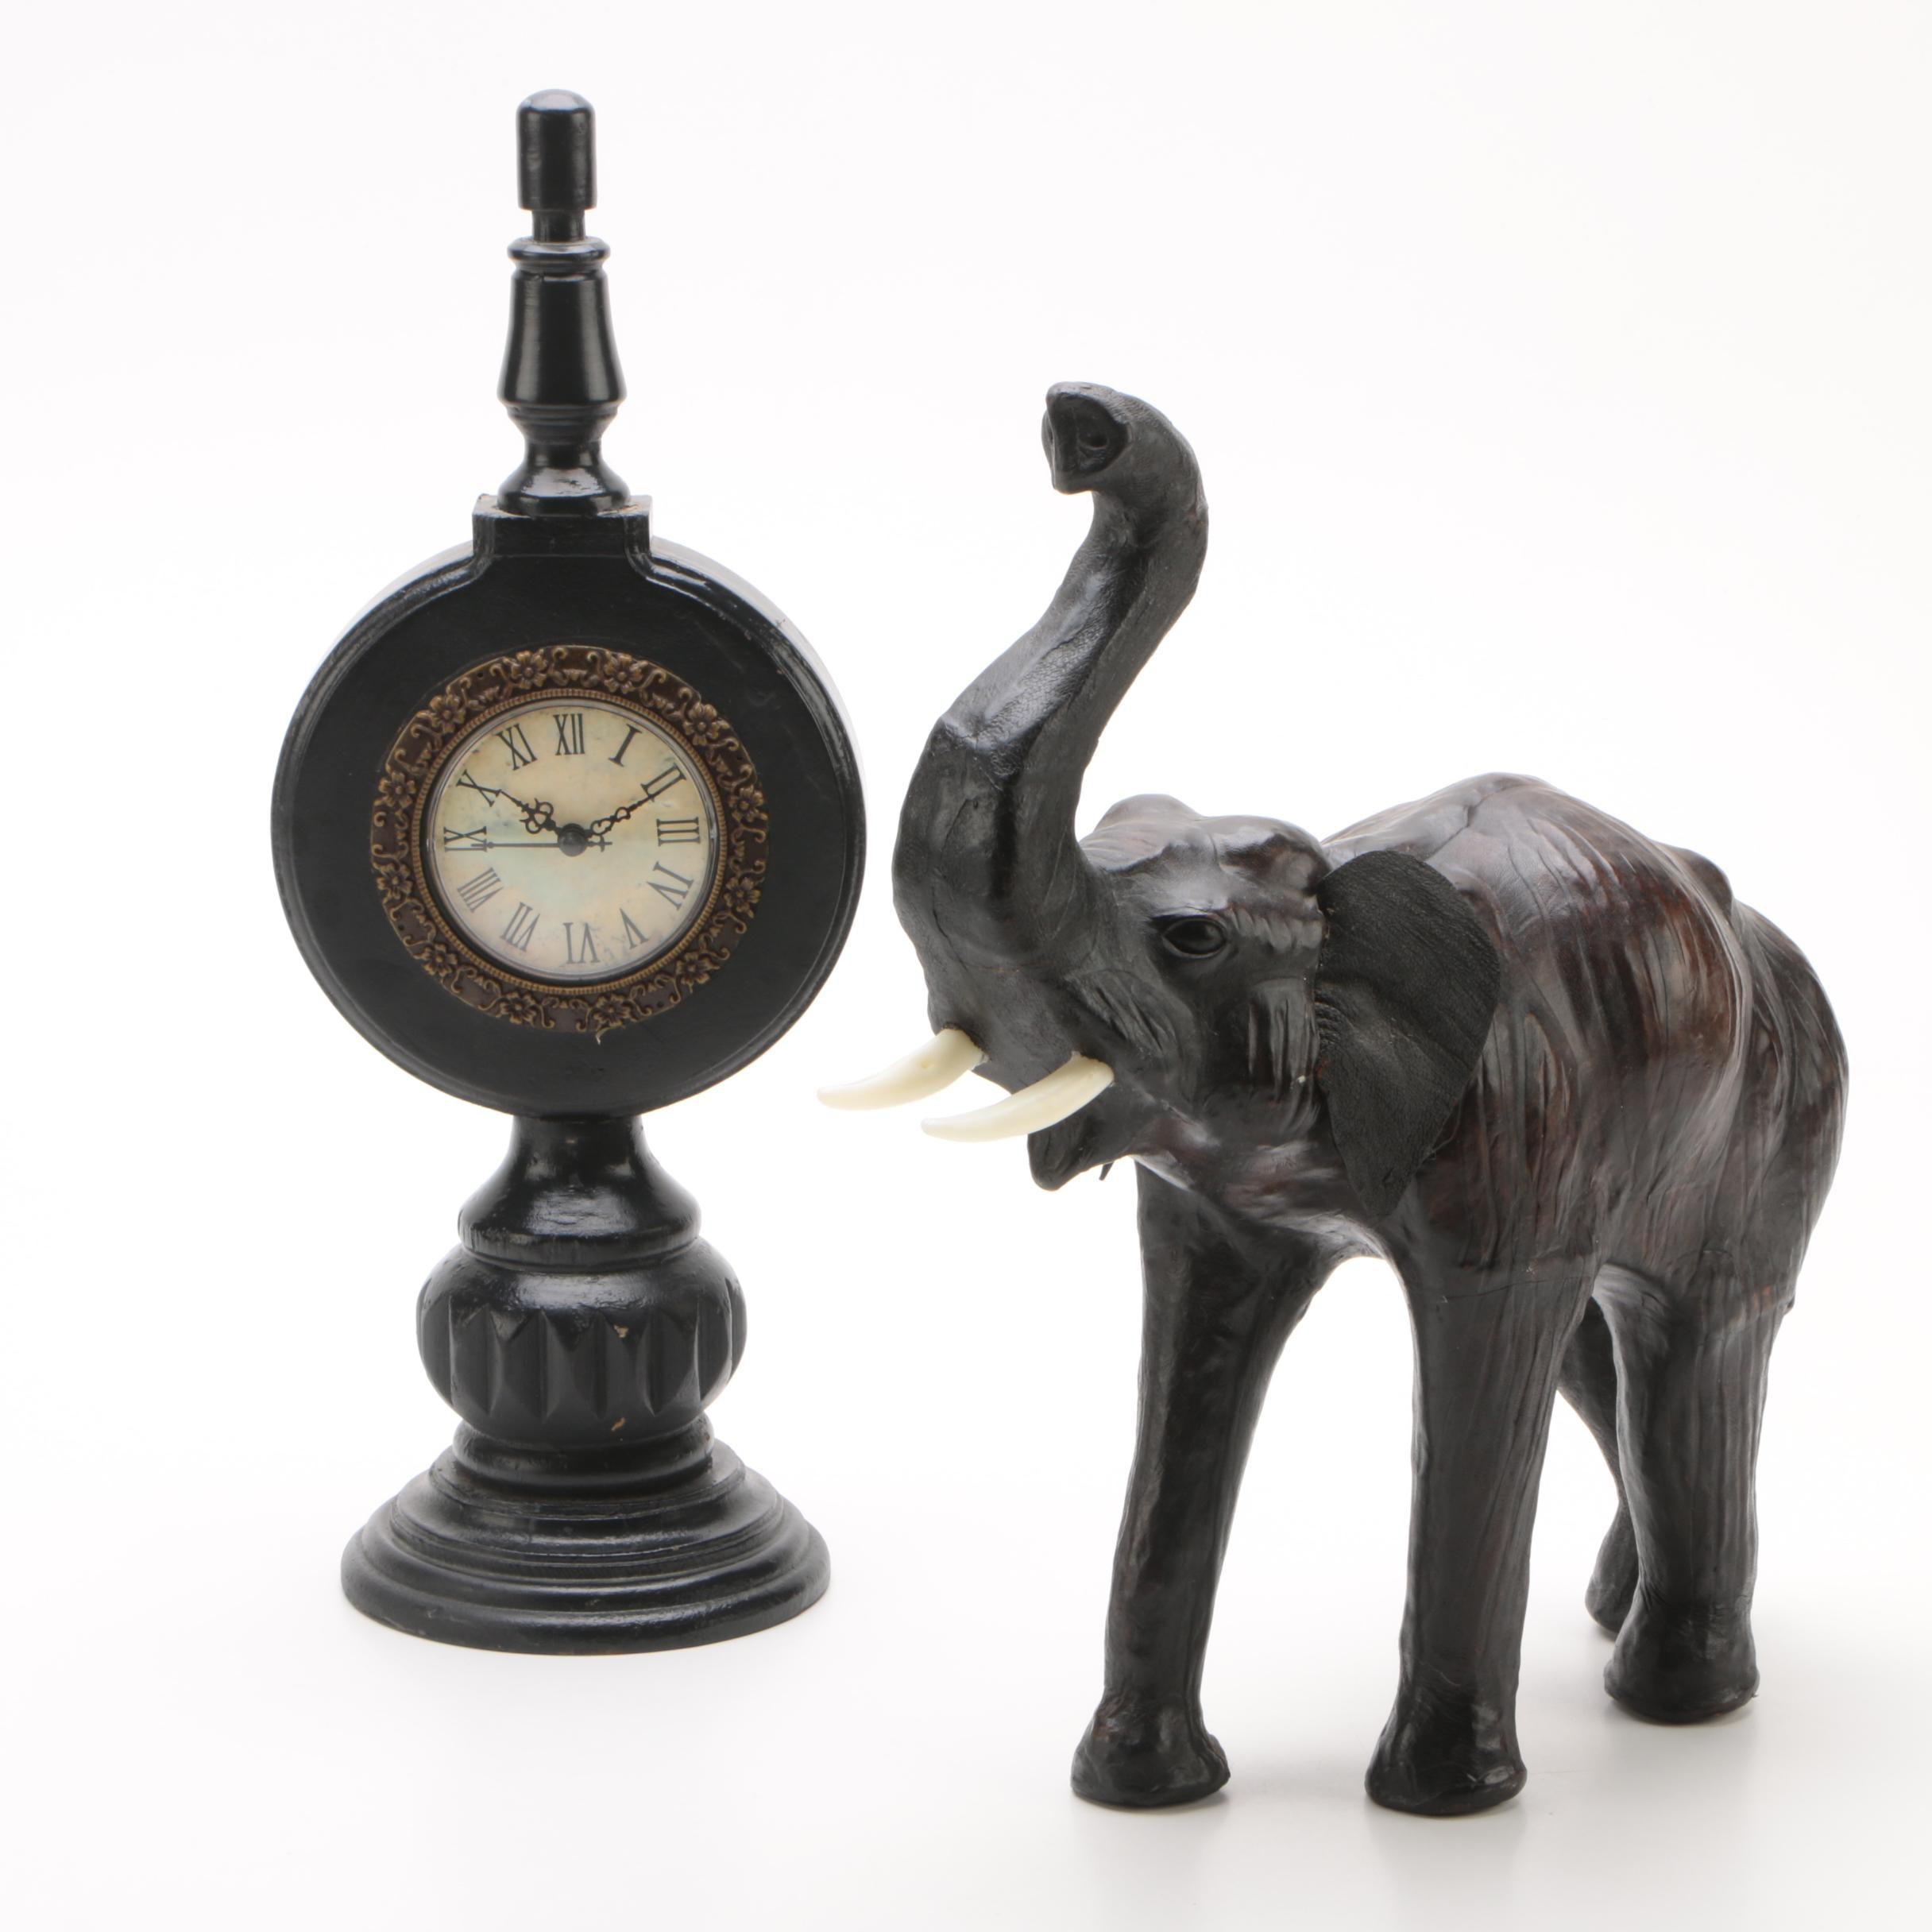 Mantel Clock with Elephant Decor